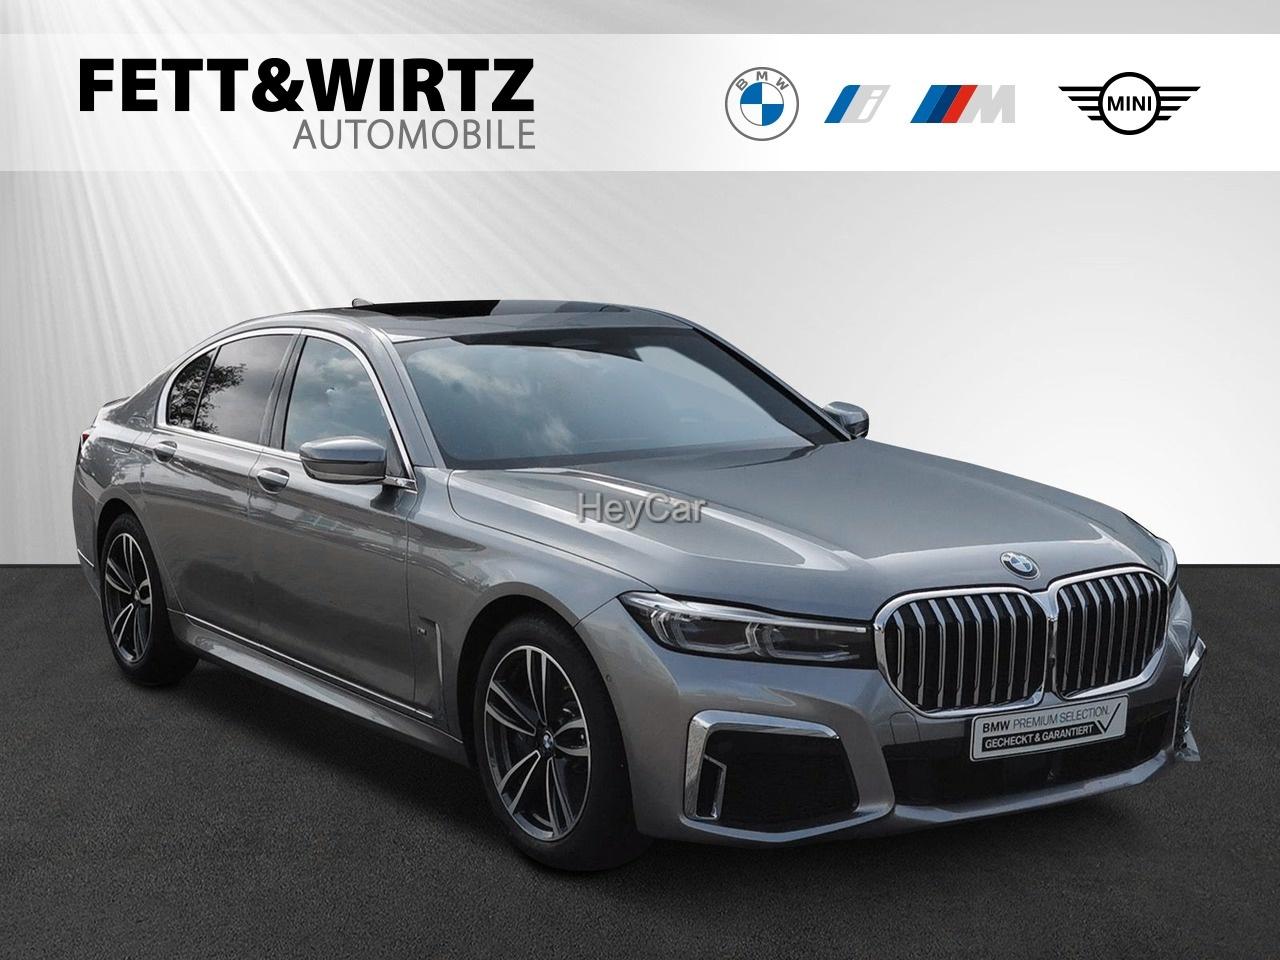 BMW 745e MSport HUD GSD Komforts. Massage HK Laser, Jahr 2020, Hybrid